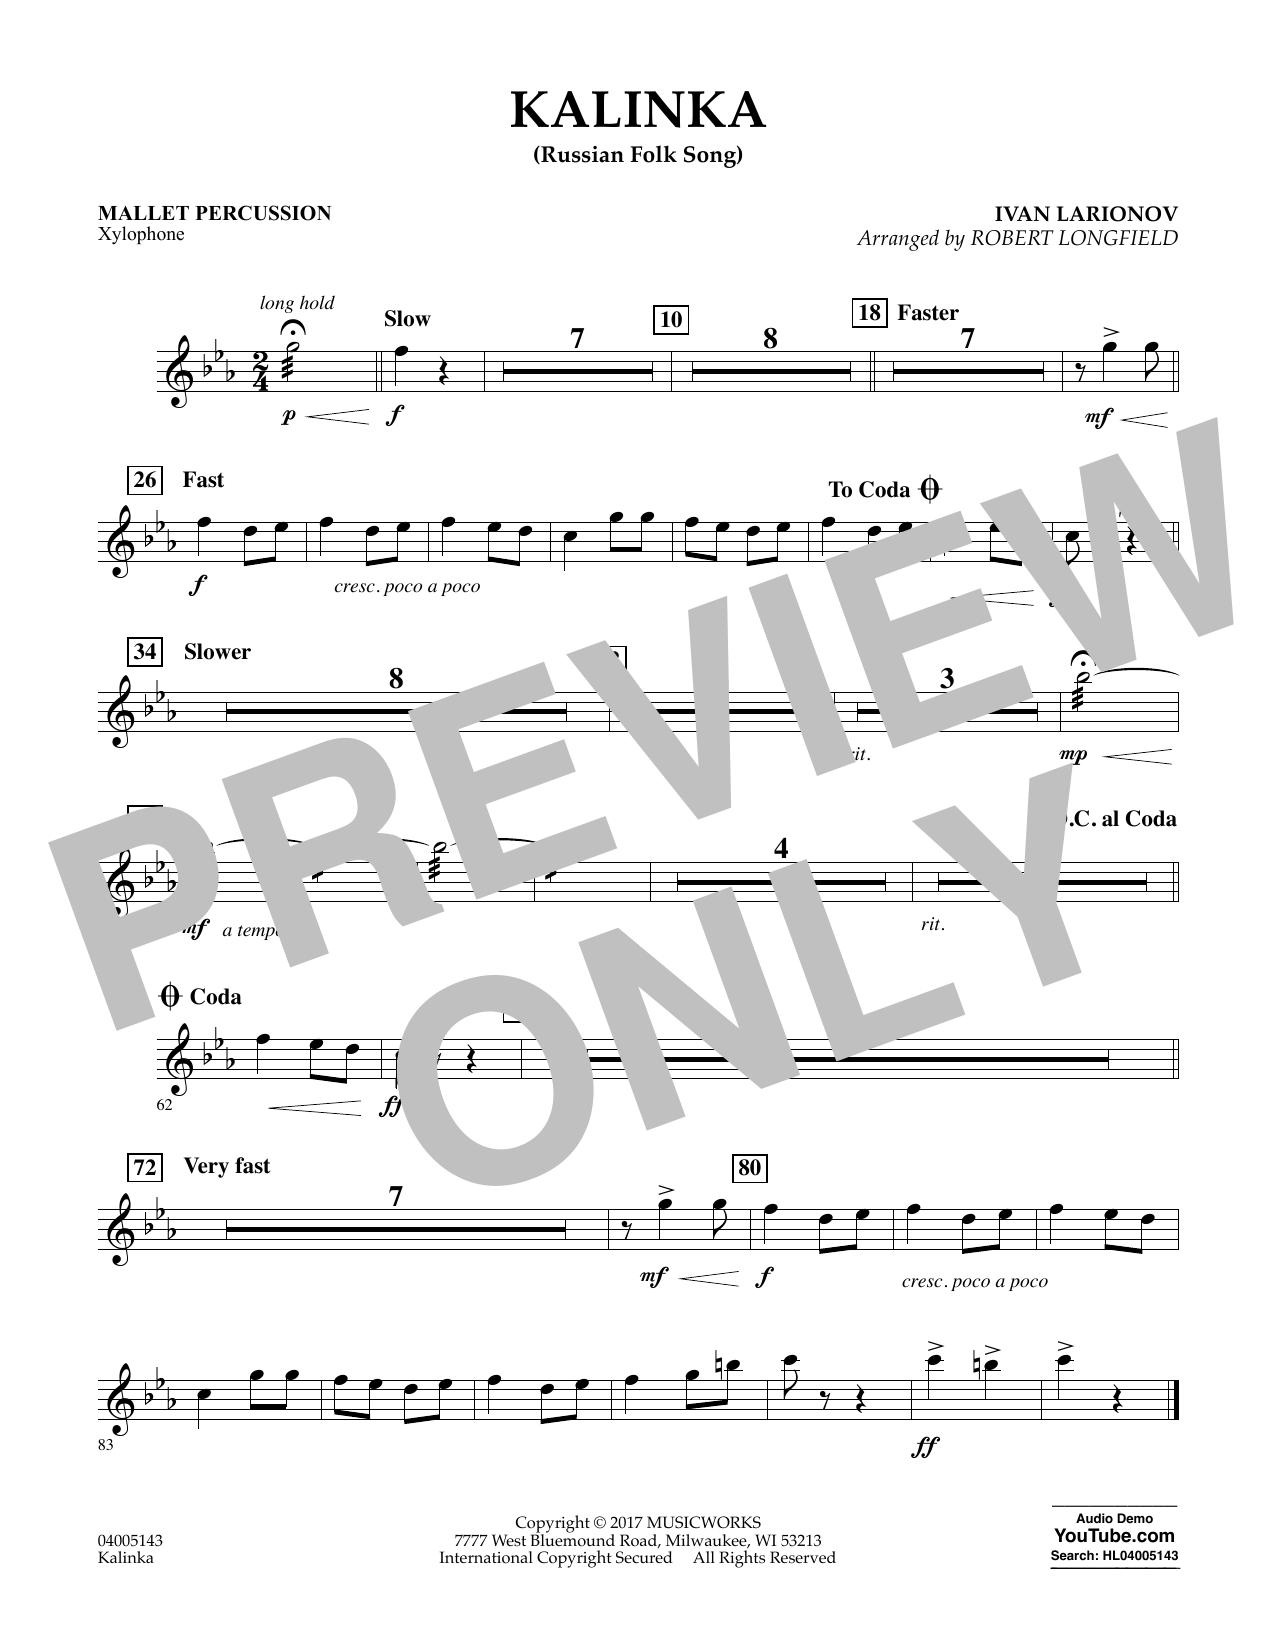 Robert Longfield Kalinka (Russian Folk Song) - Mallet Percussion sheet music notes and chords. Download Printable PDF.